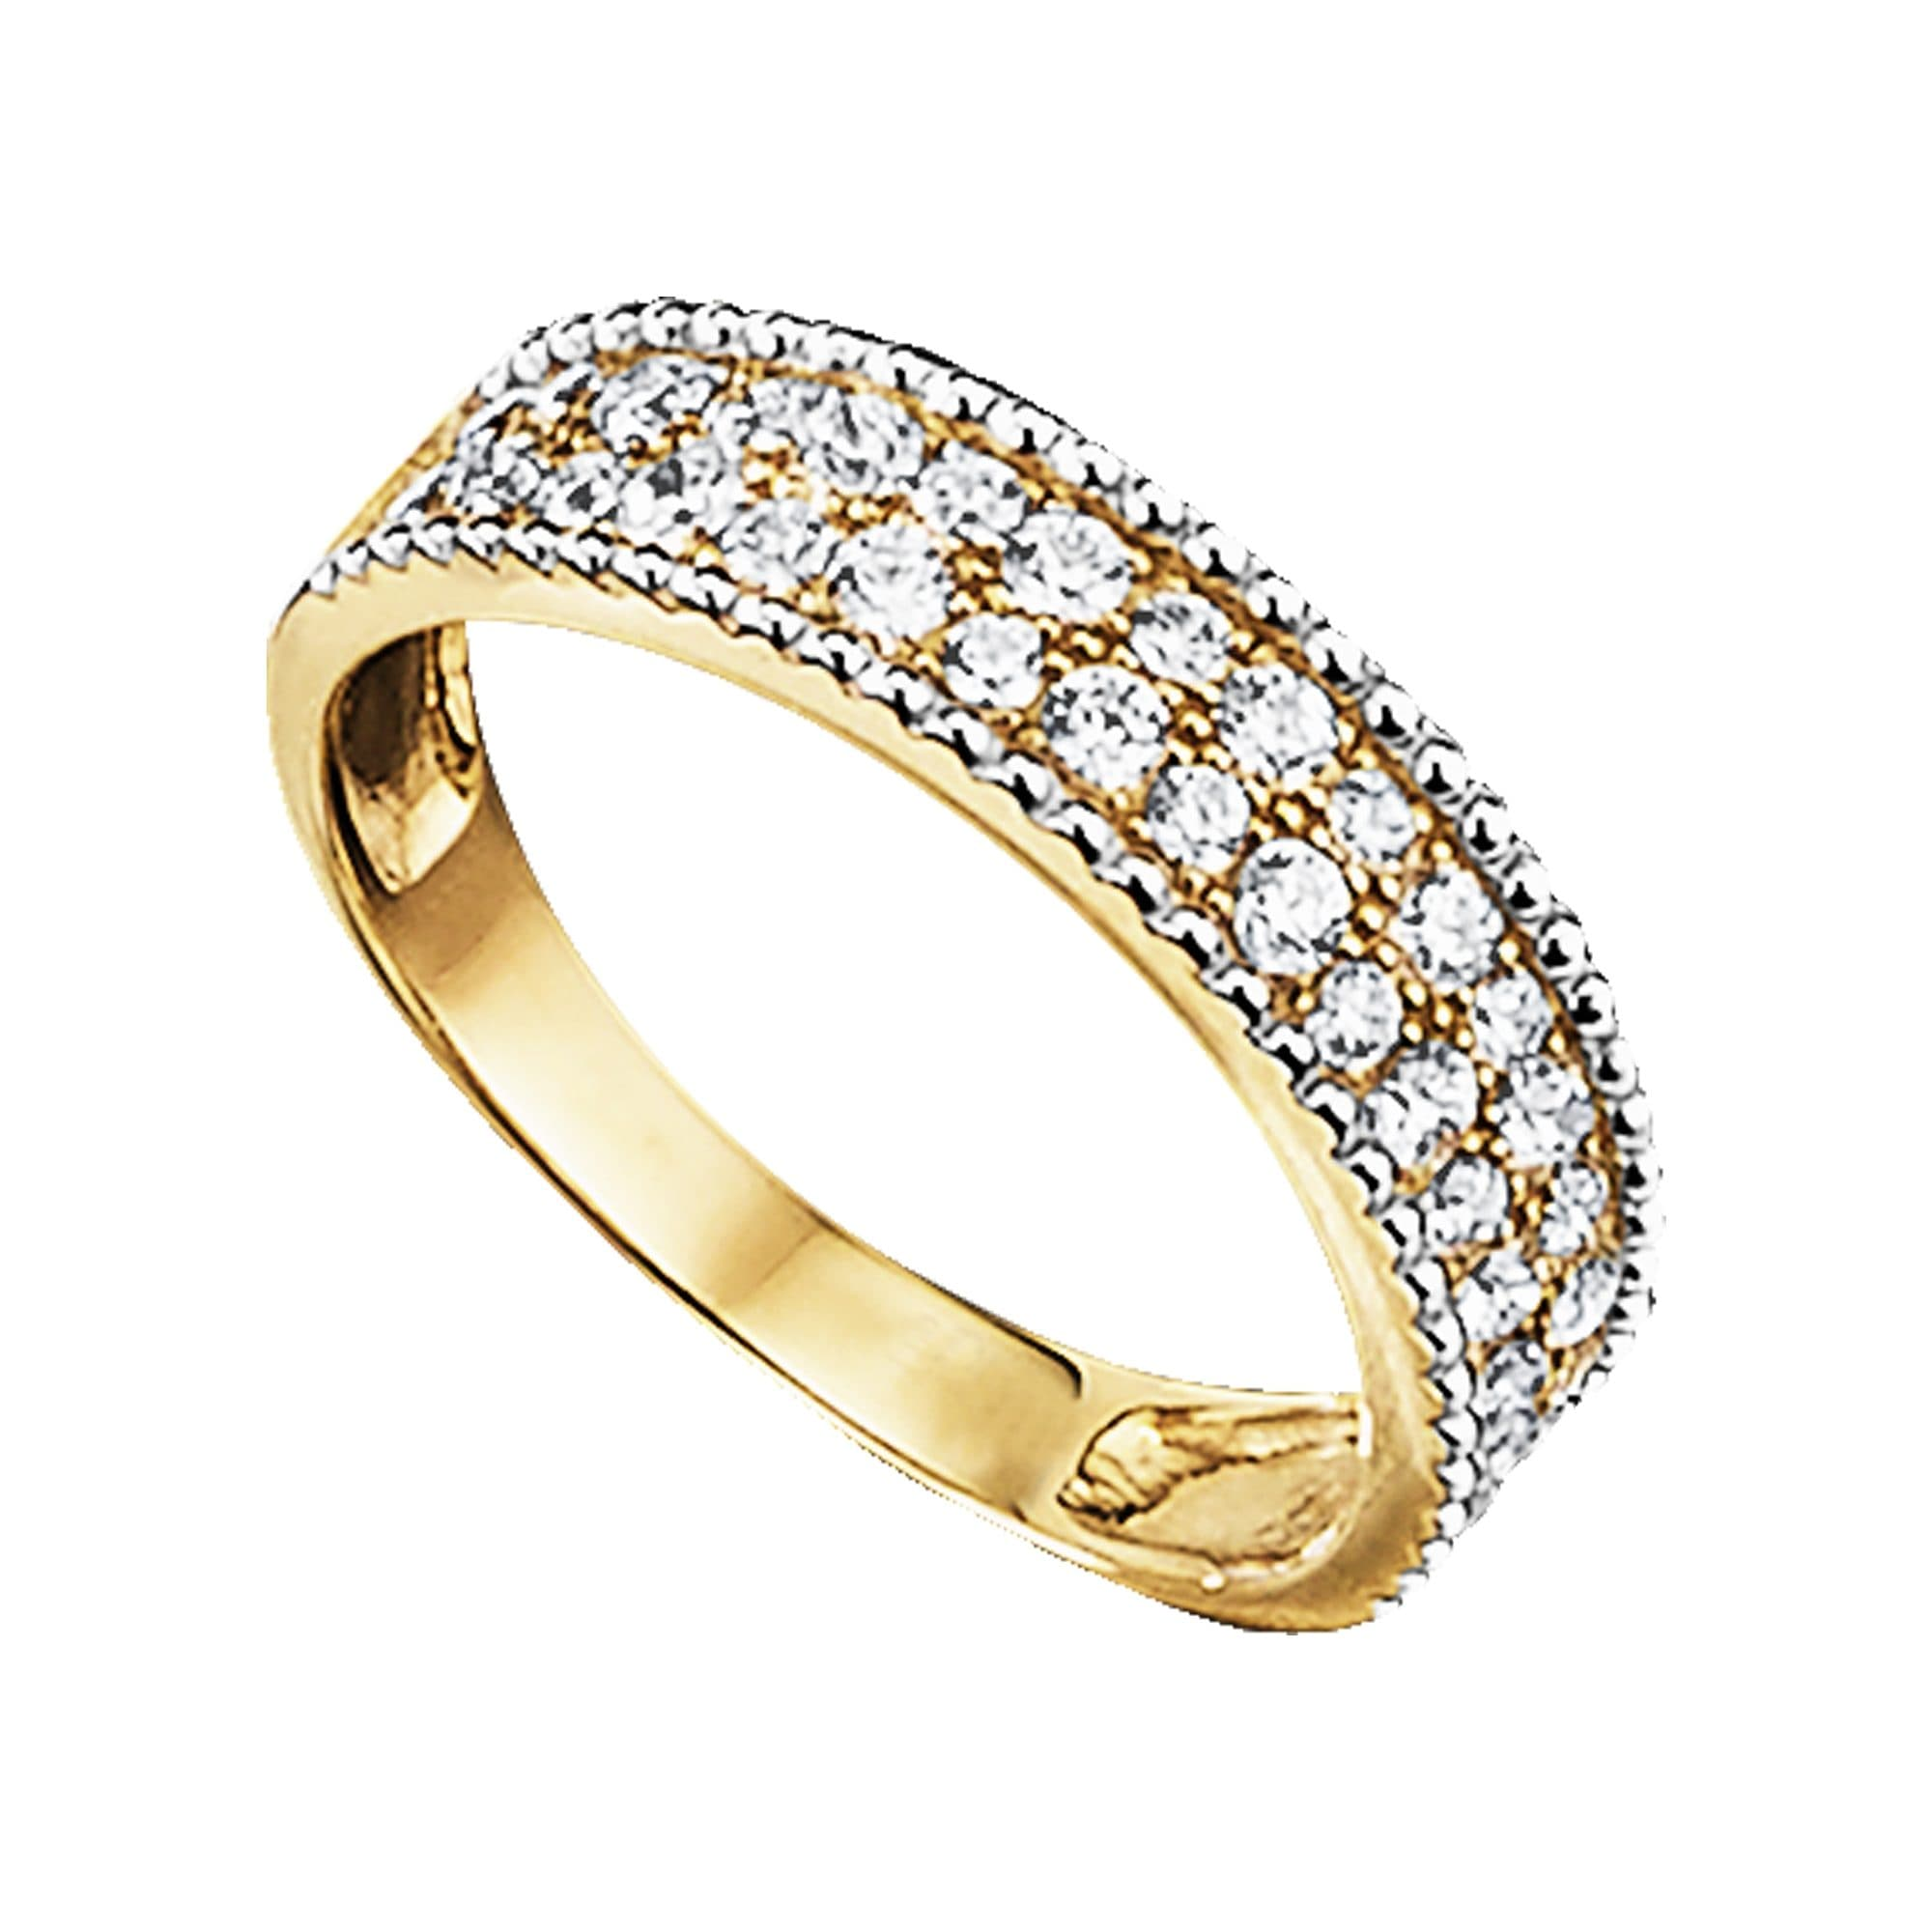 Jacques Lemans Ring 375 Gold